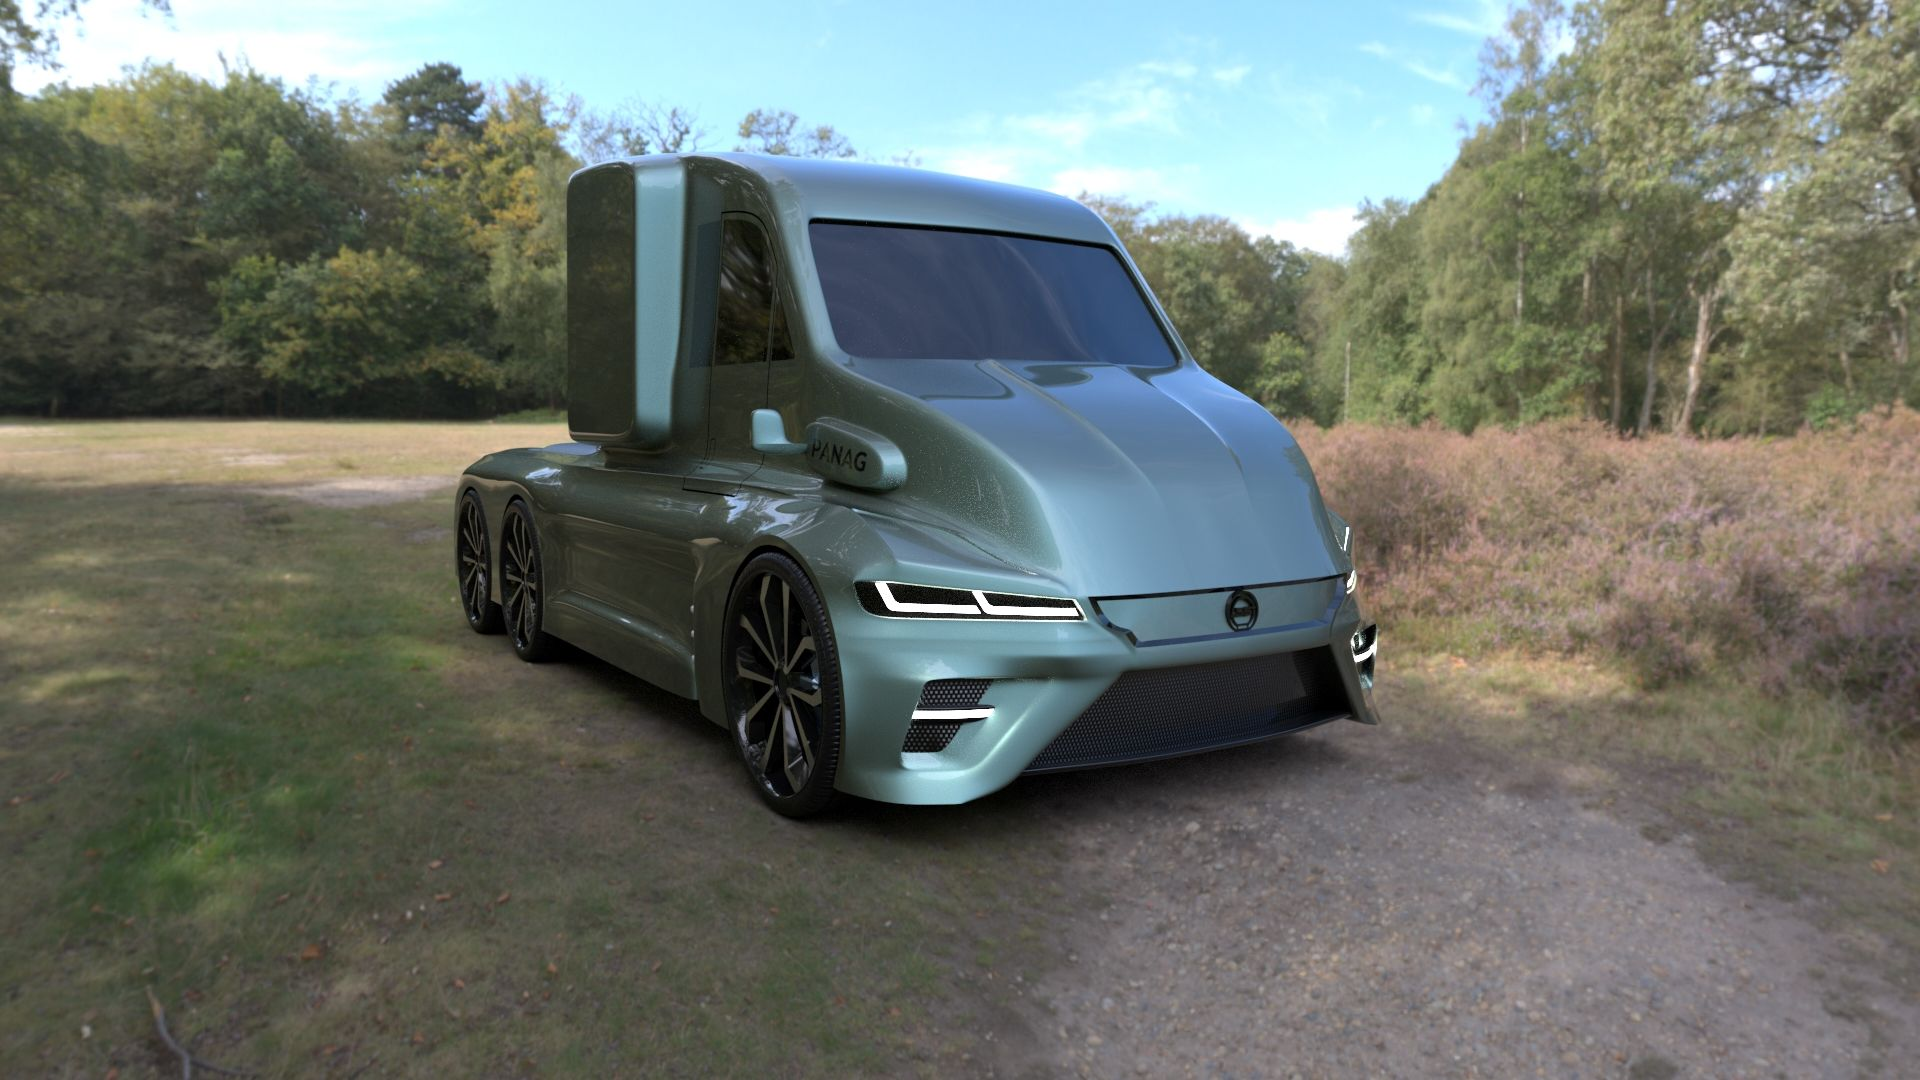 Truck-3500-3500